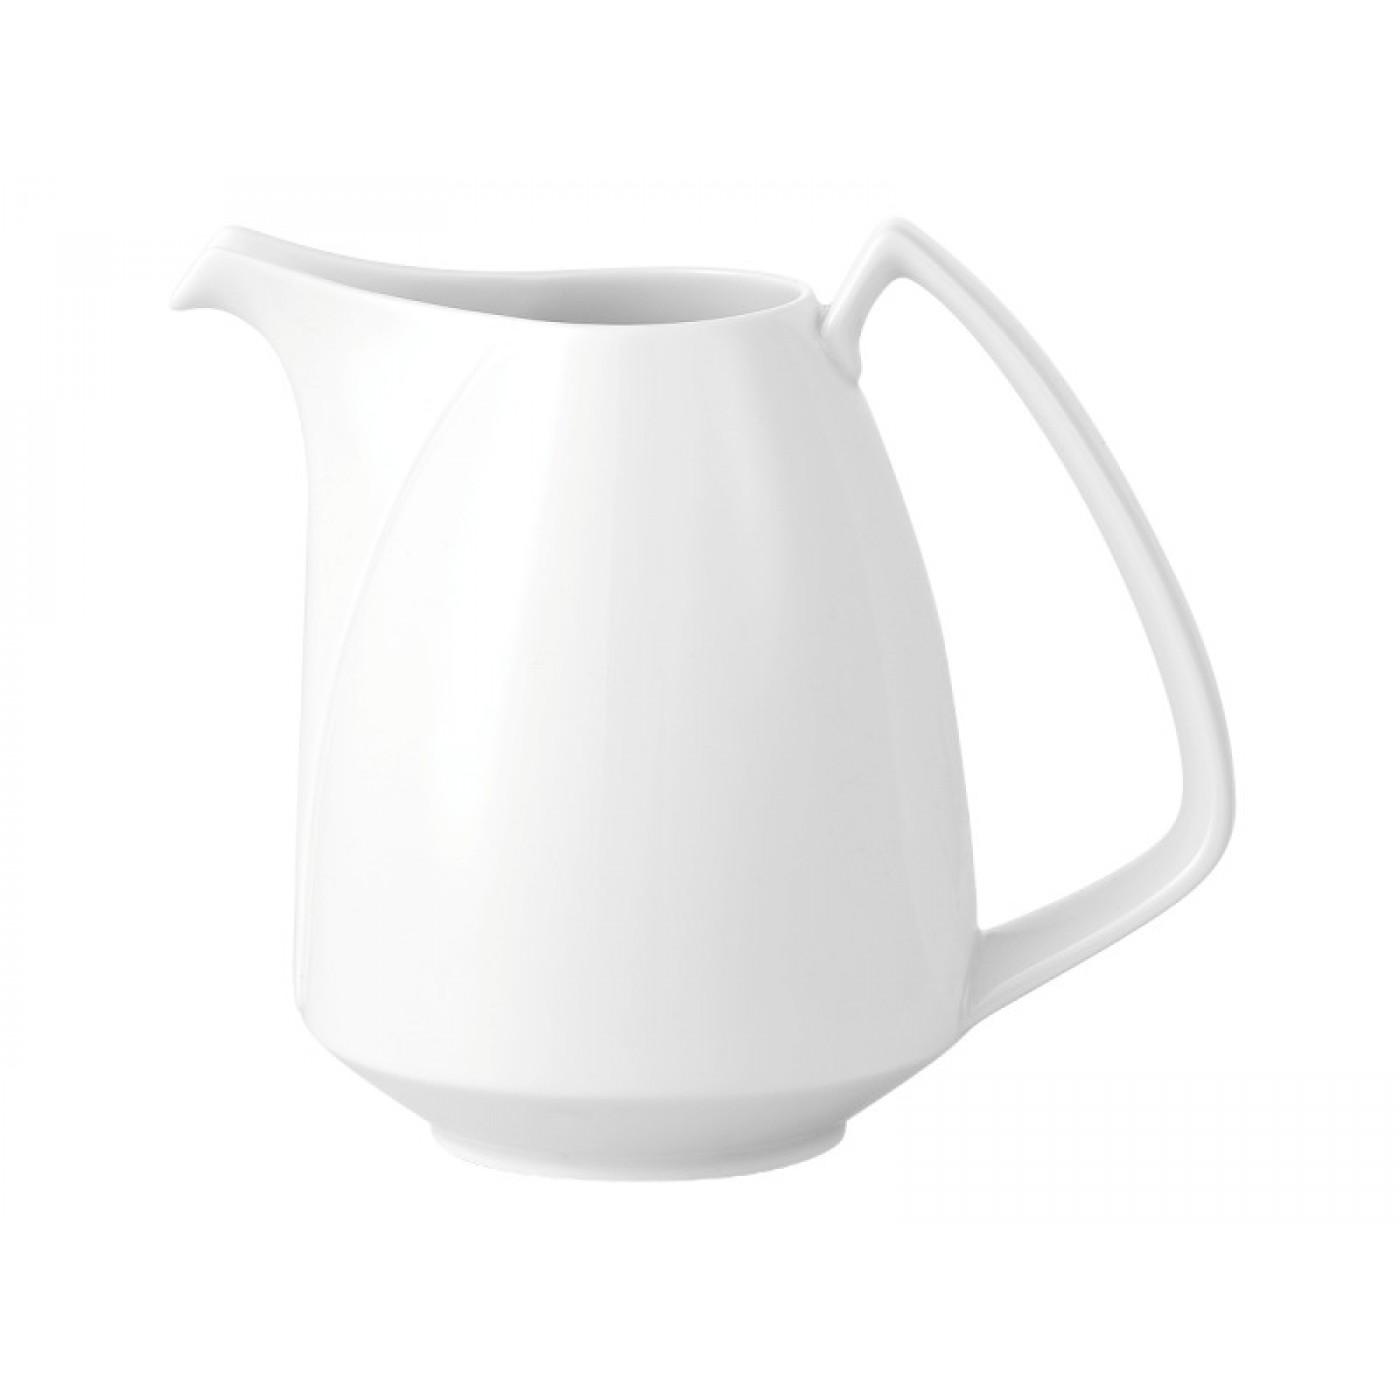 TAC White džbán na vodu 1,15 l - Thomas Rosenthal